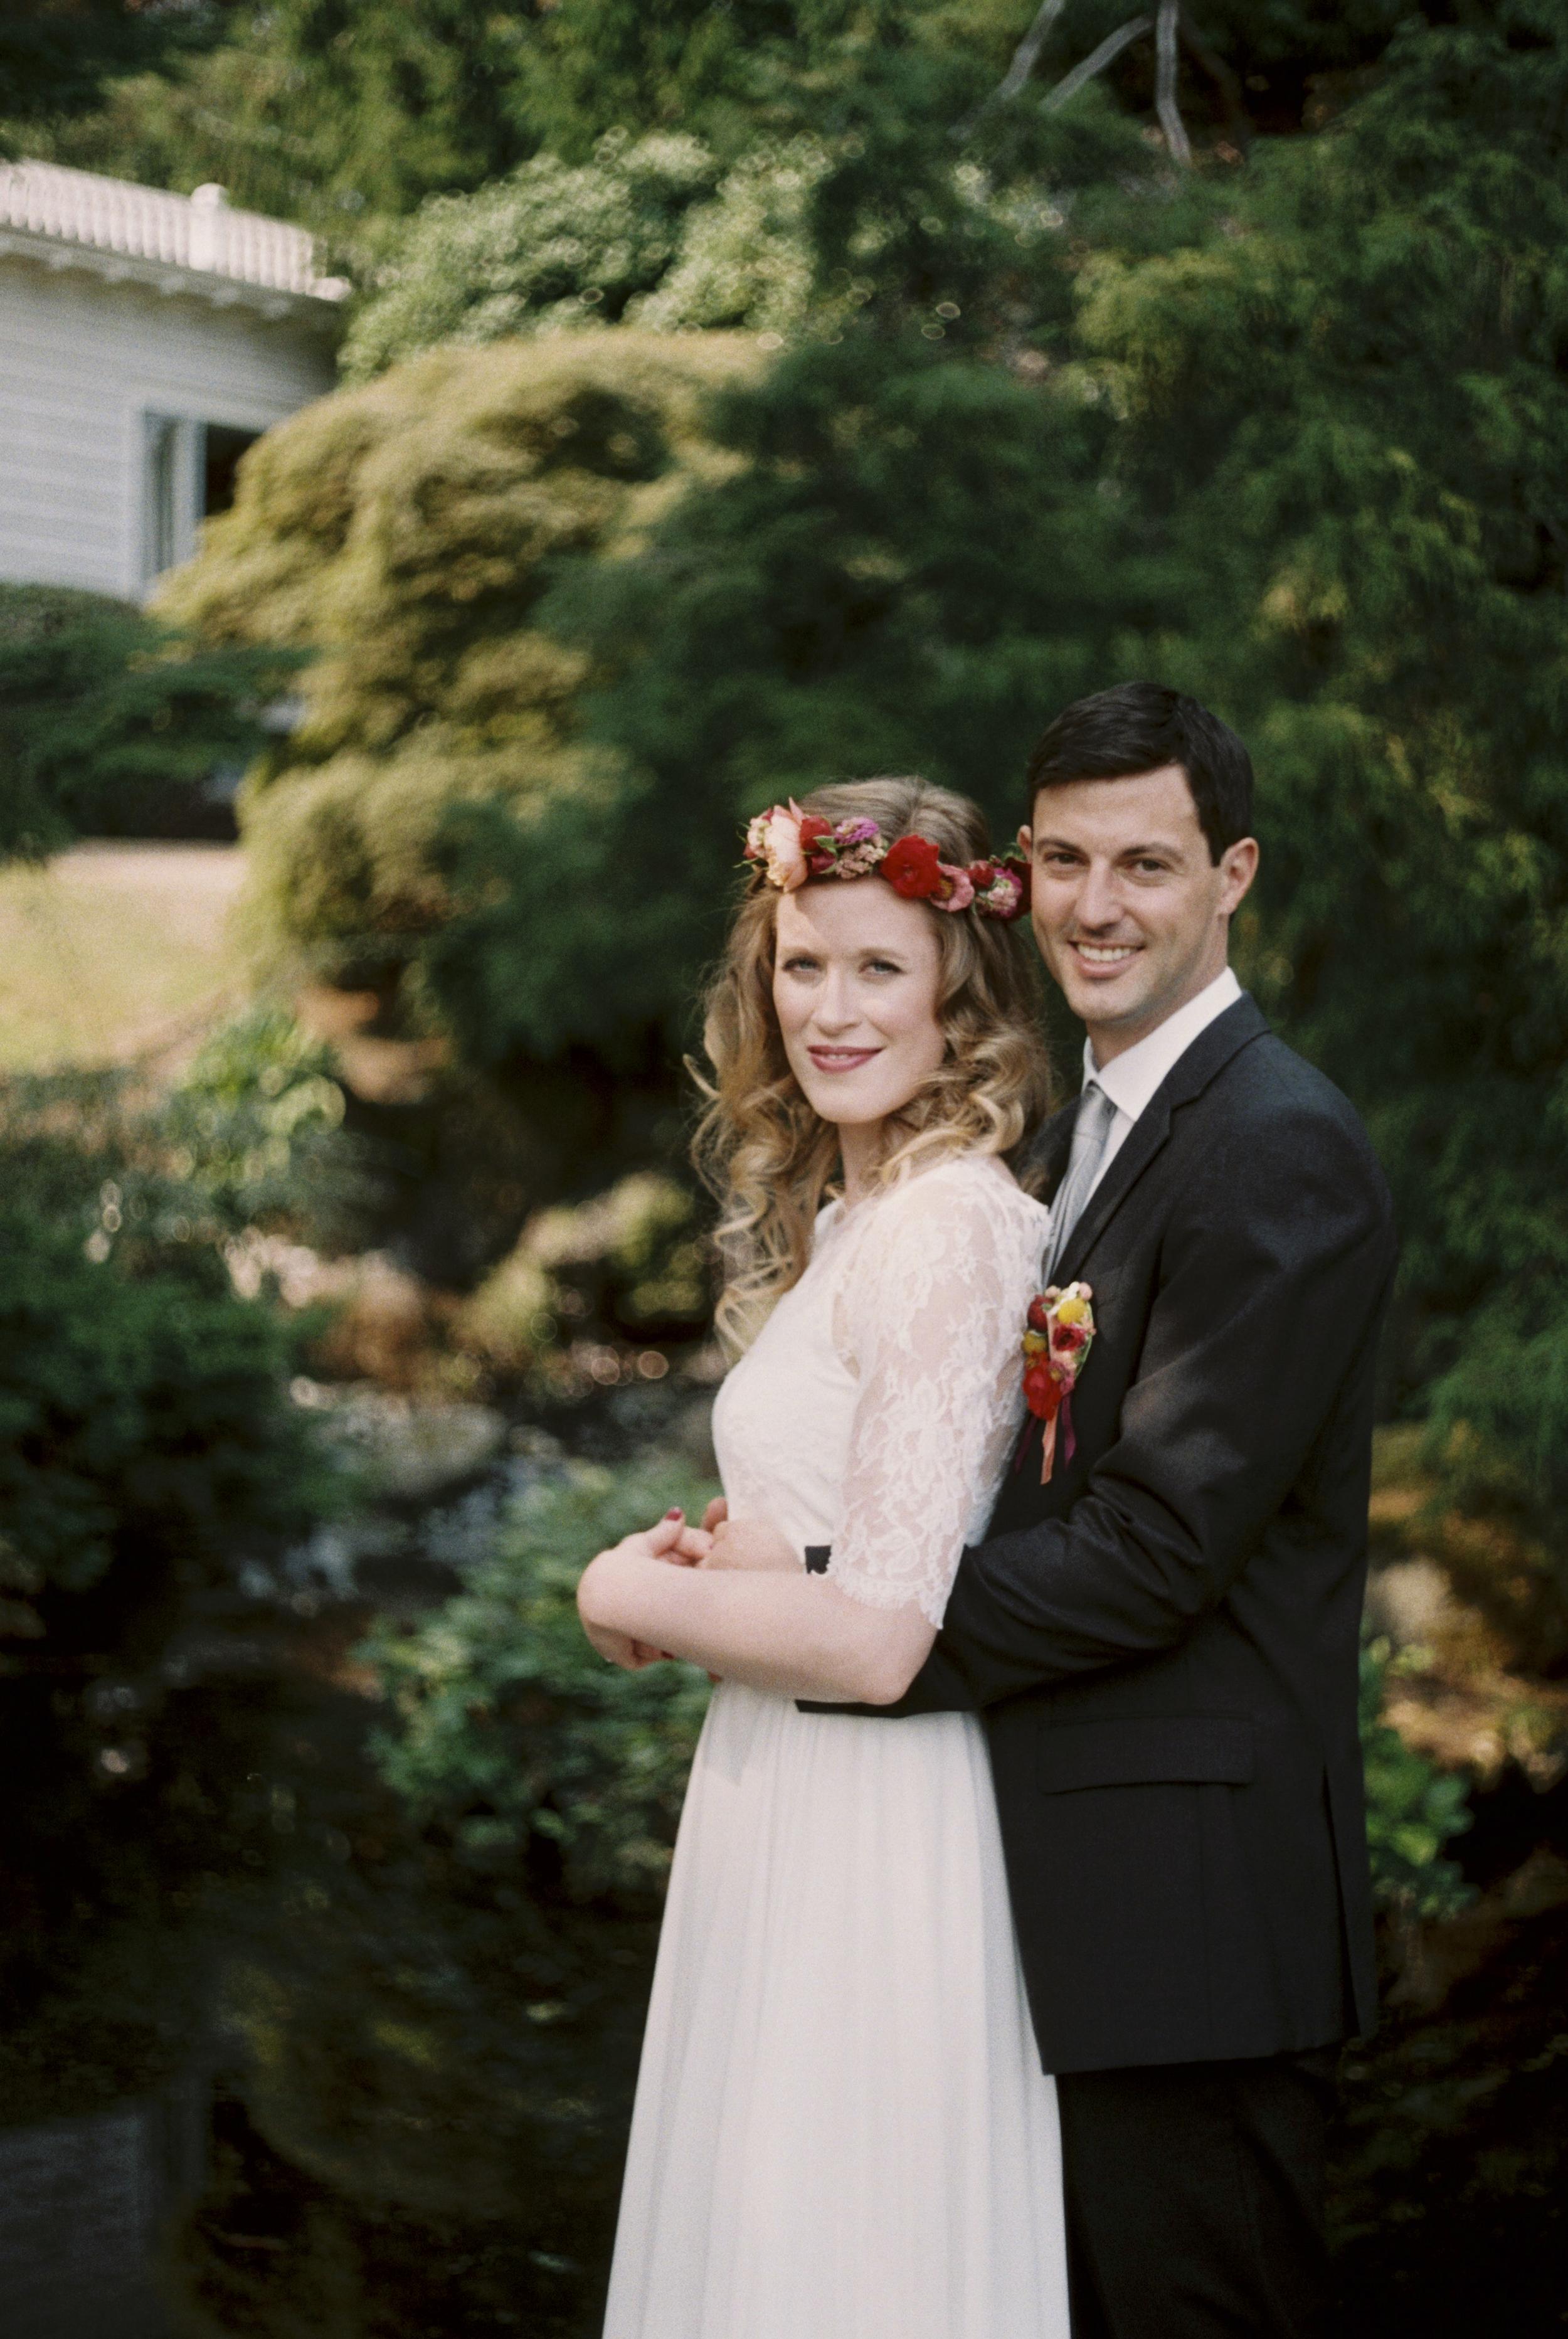 Julie&Matthias-526.jpg